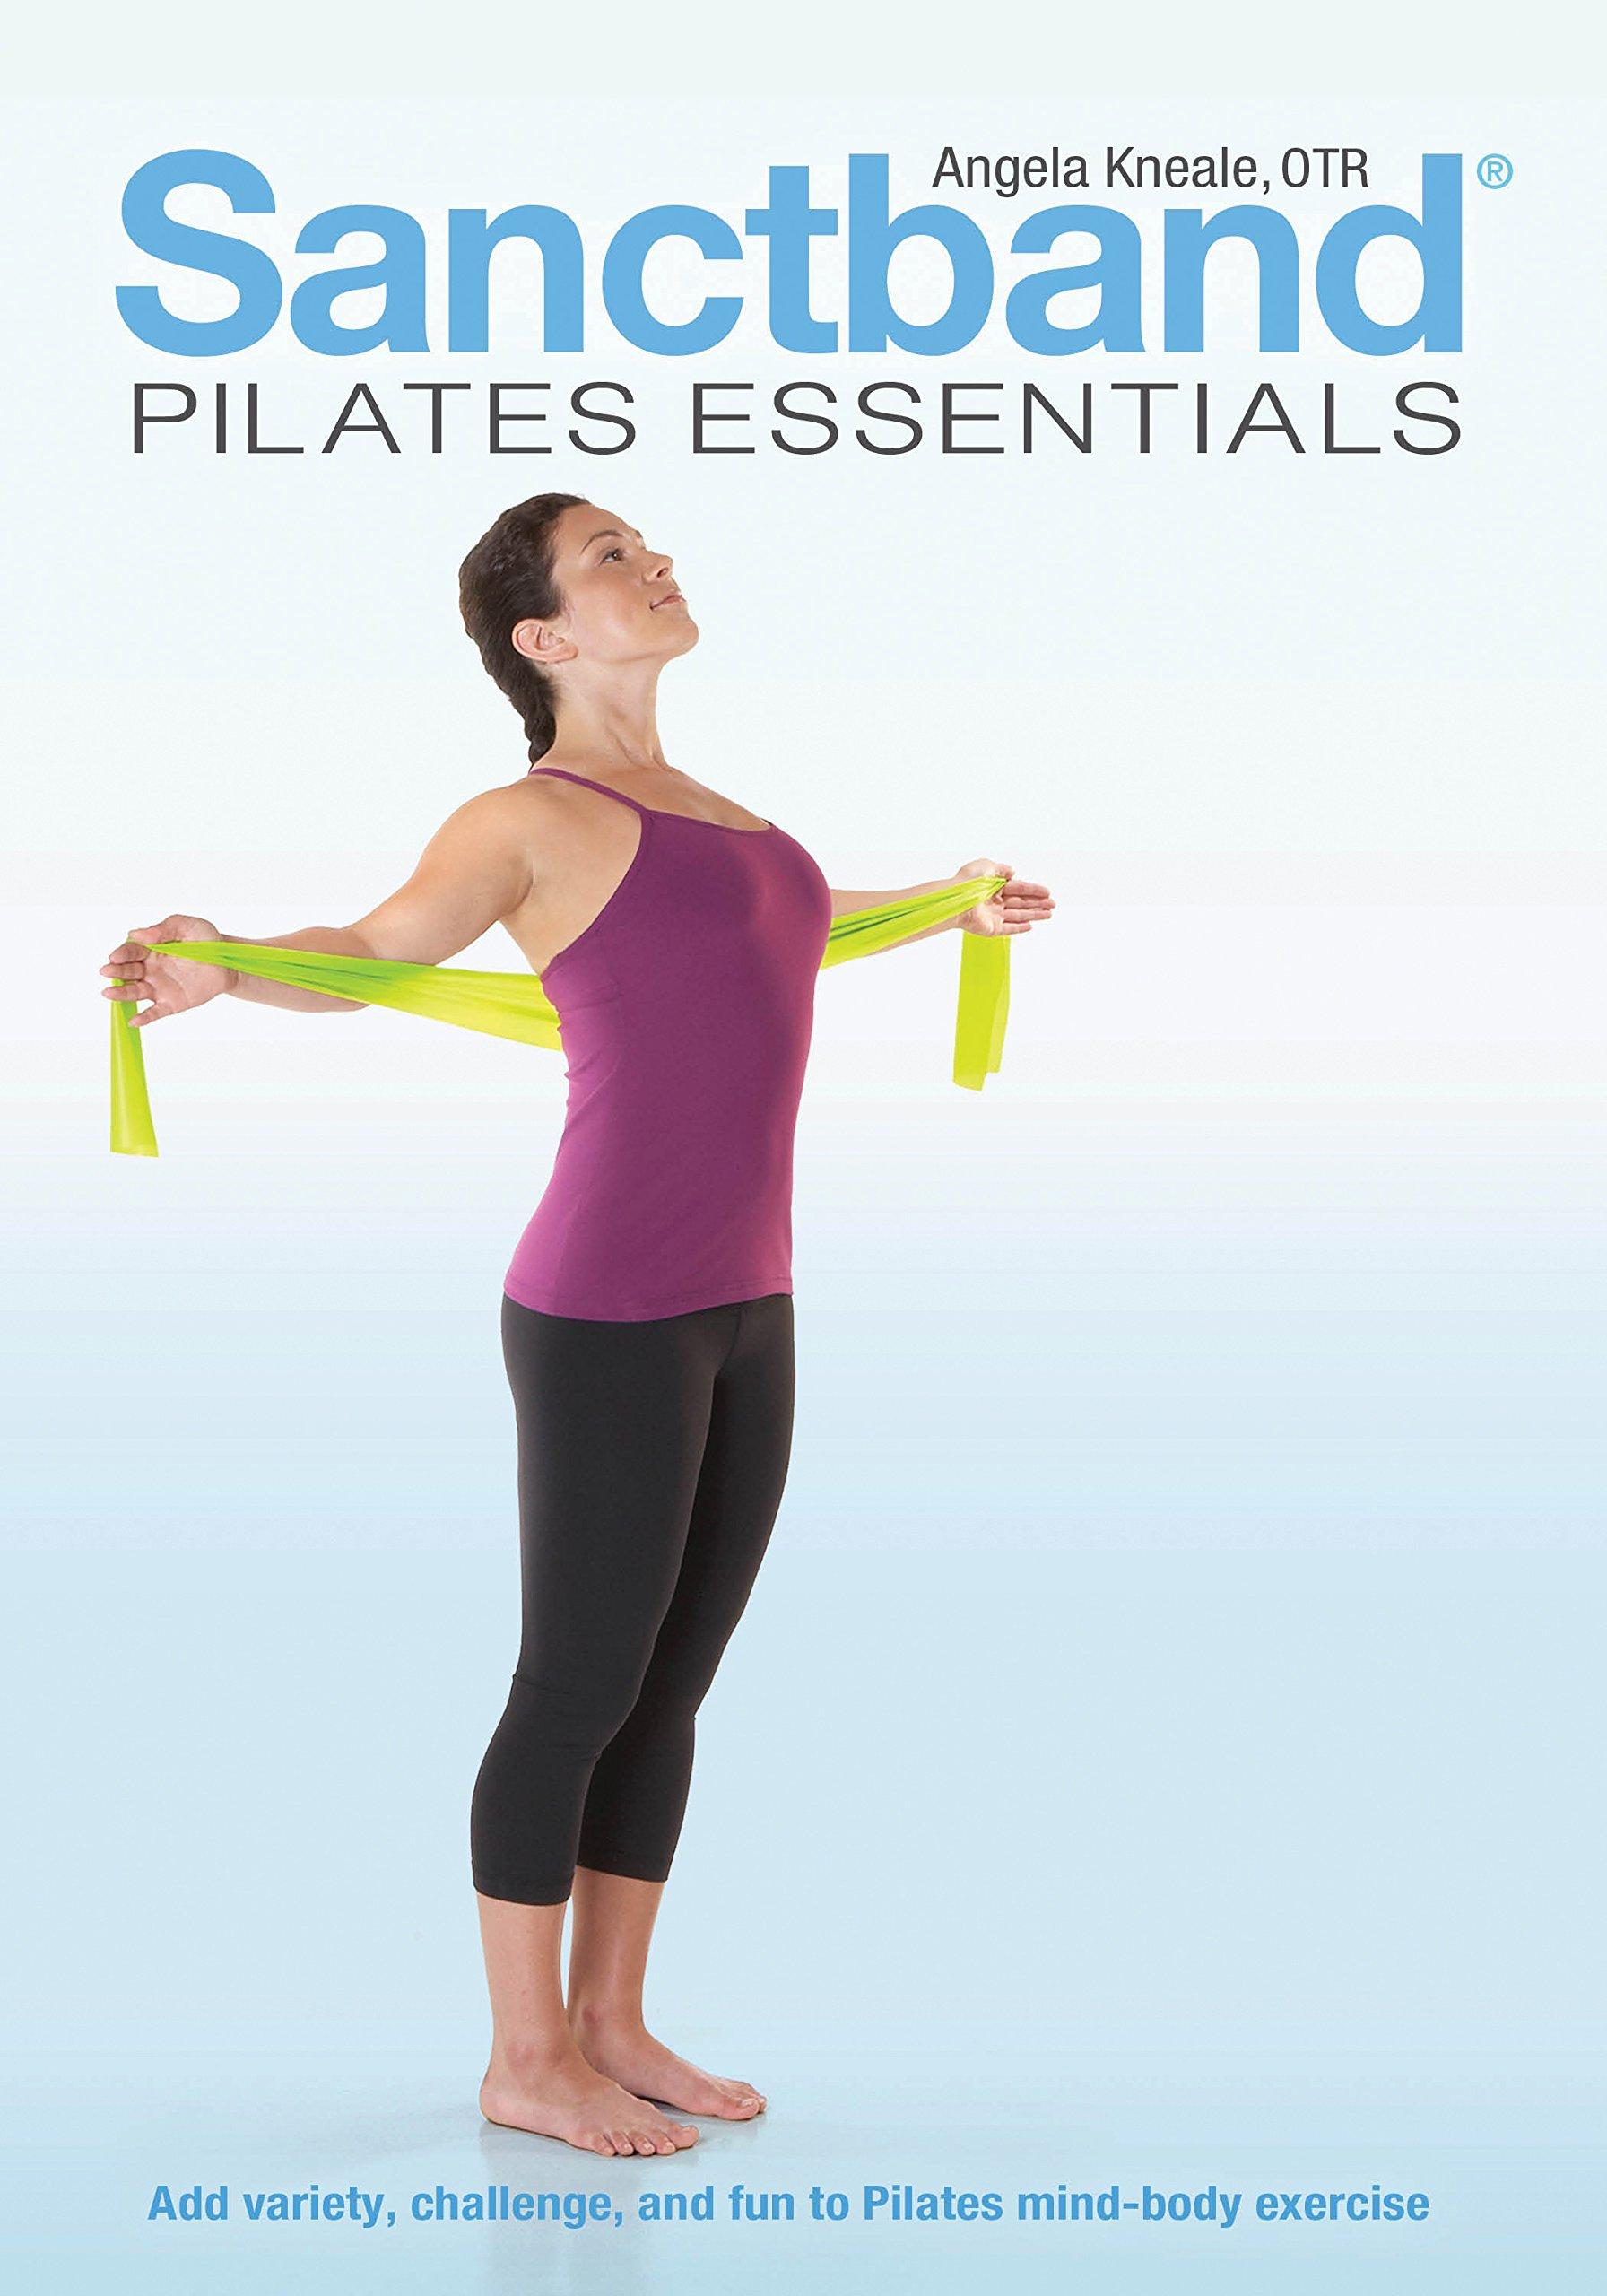 Sanctband Pilates Essentials Angela Kneale product image